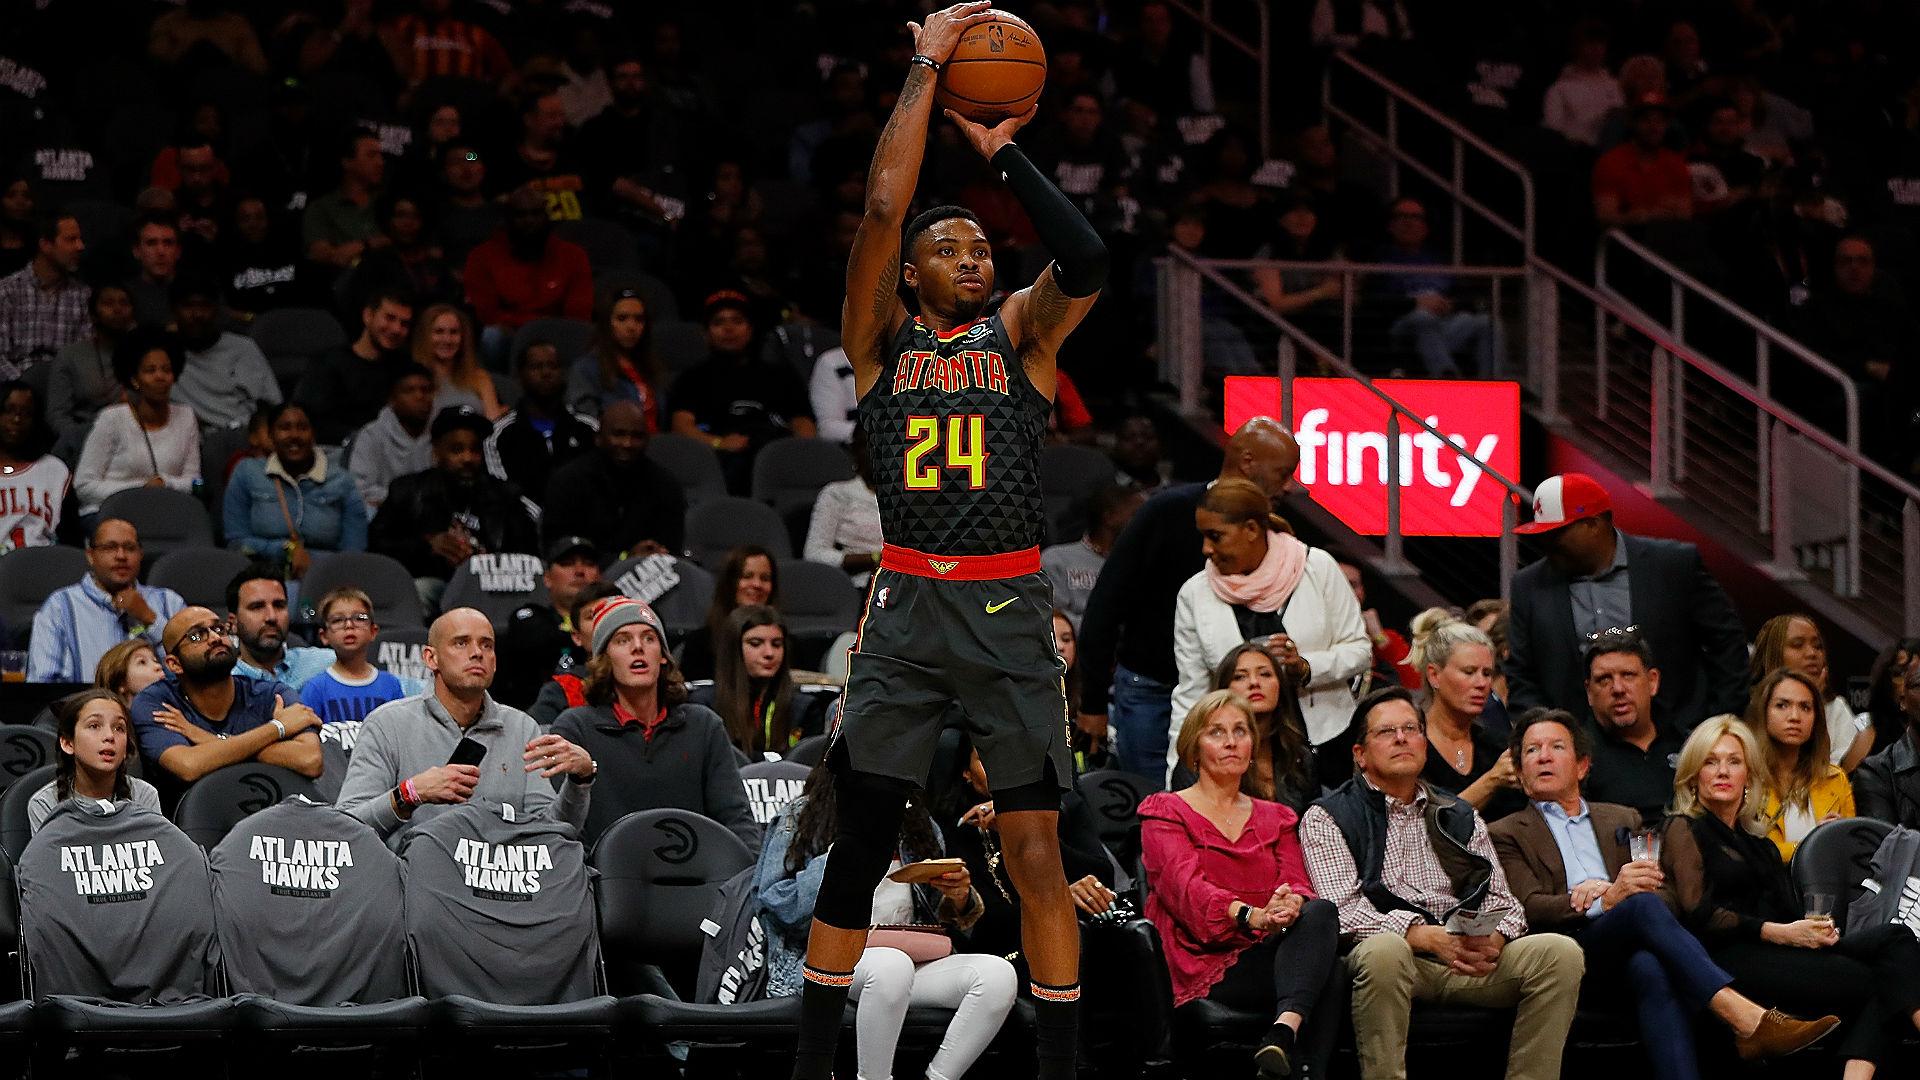 NBA trade news: Trail Blazers acquire Kent Bazemore, send Evan Turner to Hawks